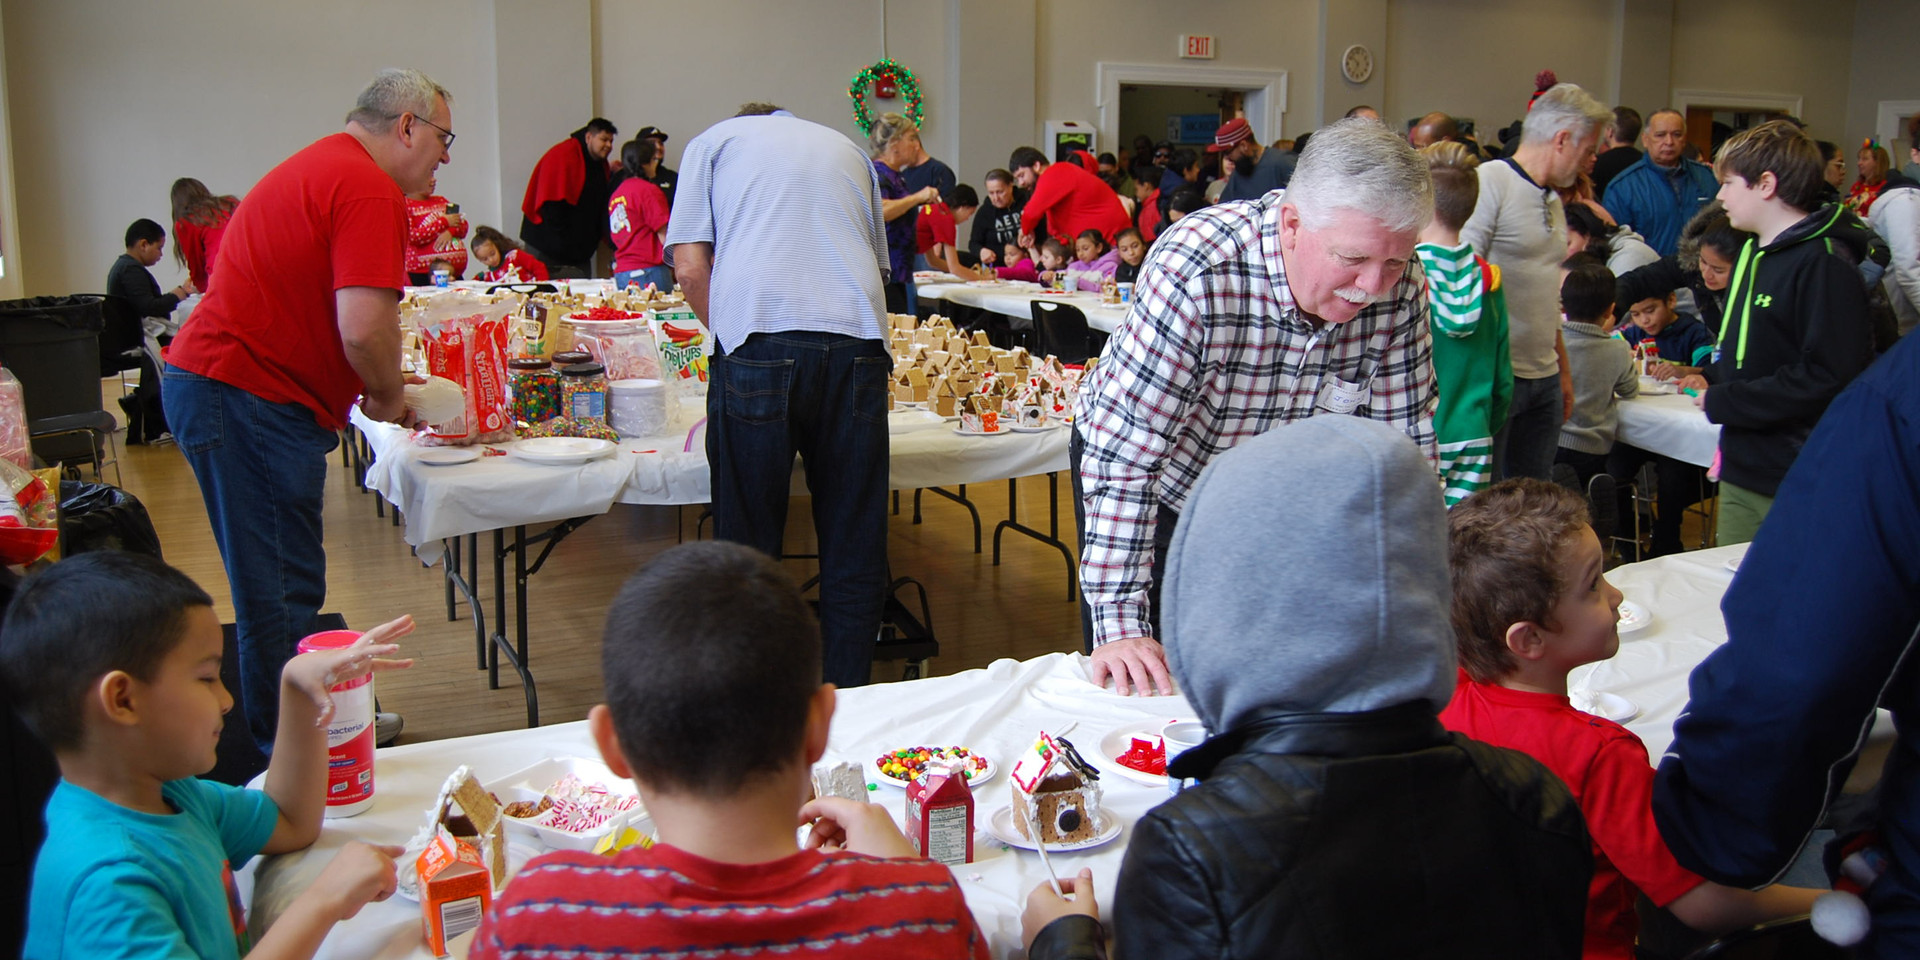 Volunteers helping the children create their gingerbread houses!